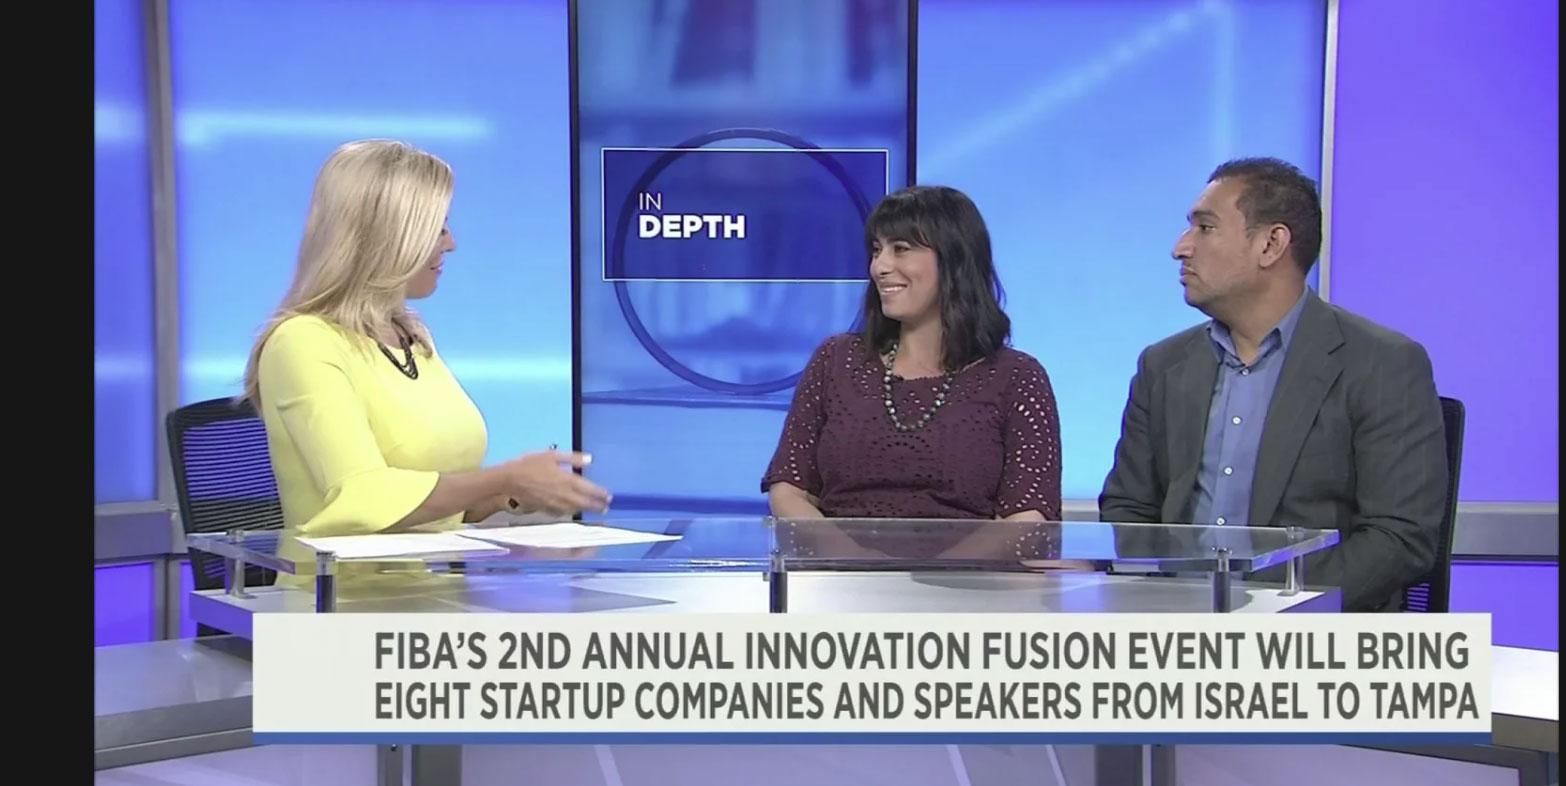 FIBA: Rachel Feinman discusses Innovation Fusion on Bay News 9